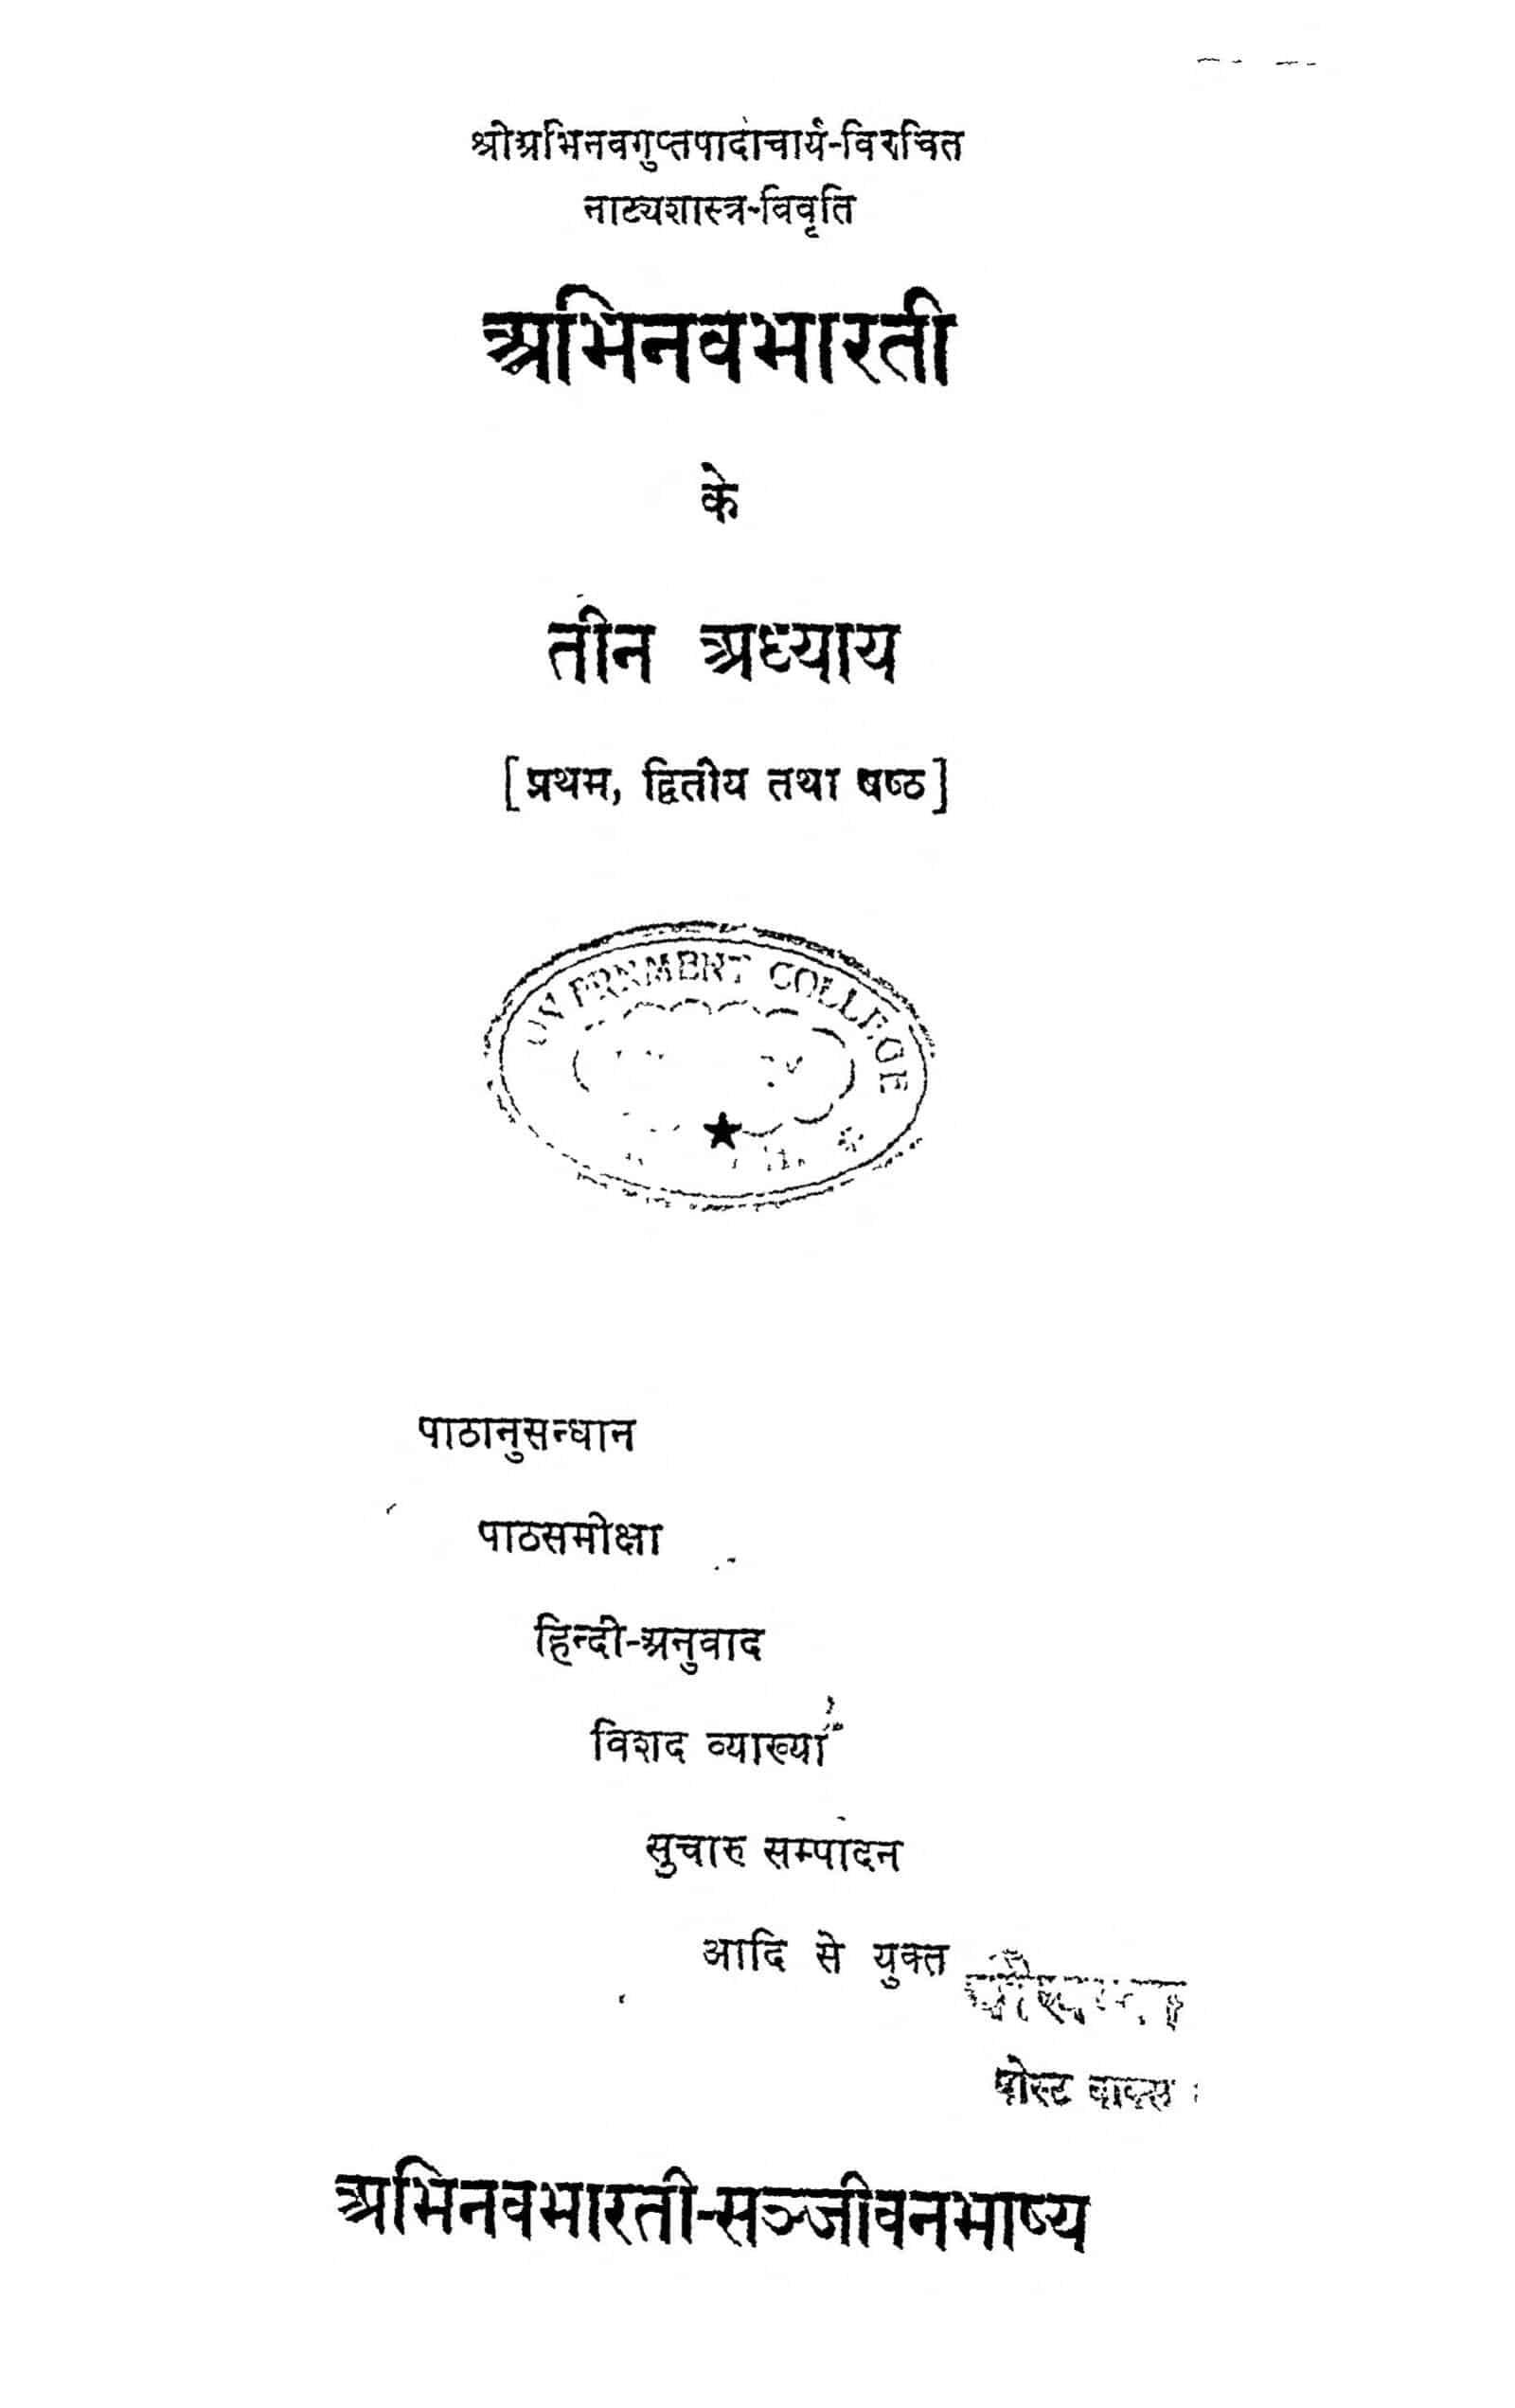 Abhinavbharati Ke Teen Adhyay  by डॉ. नगेन्द्र - Dr.Nagendra